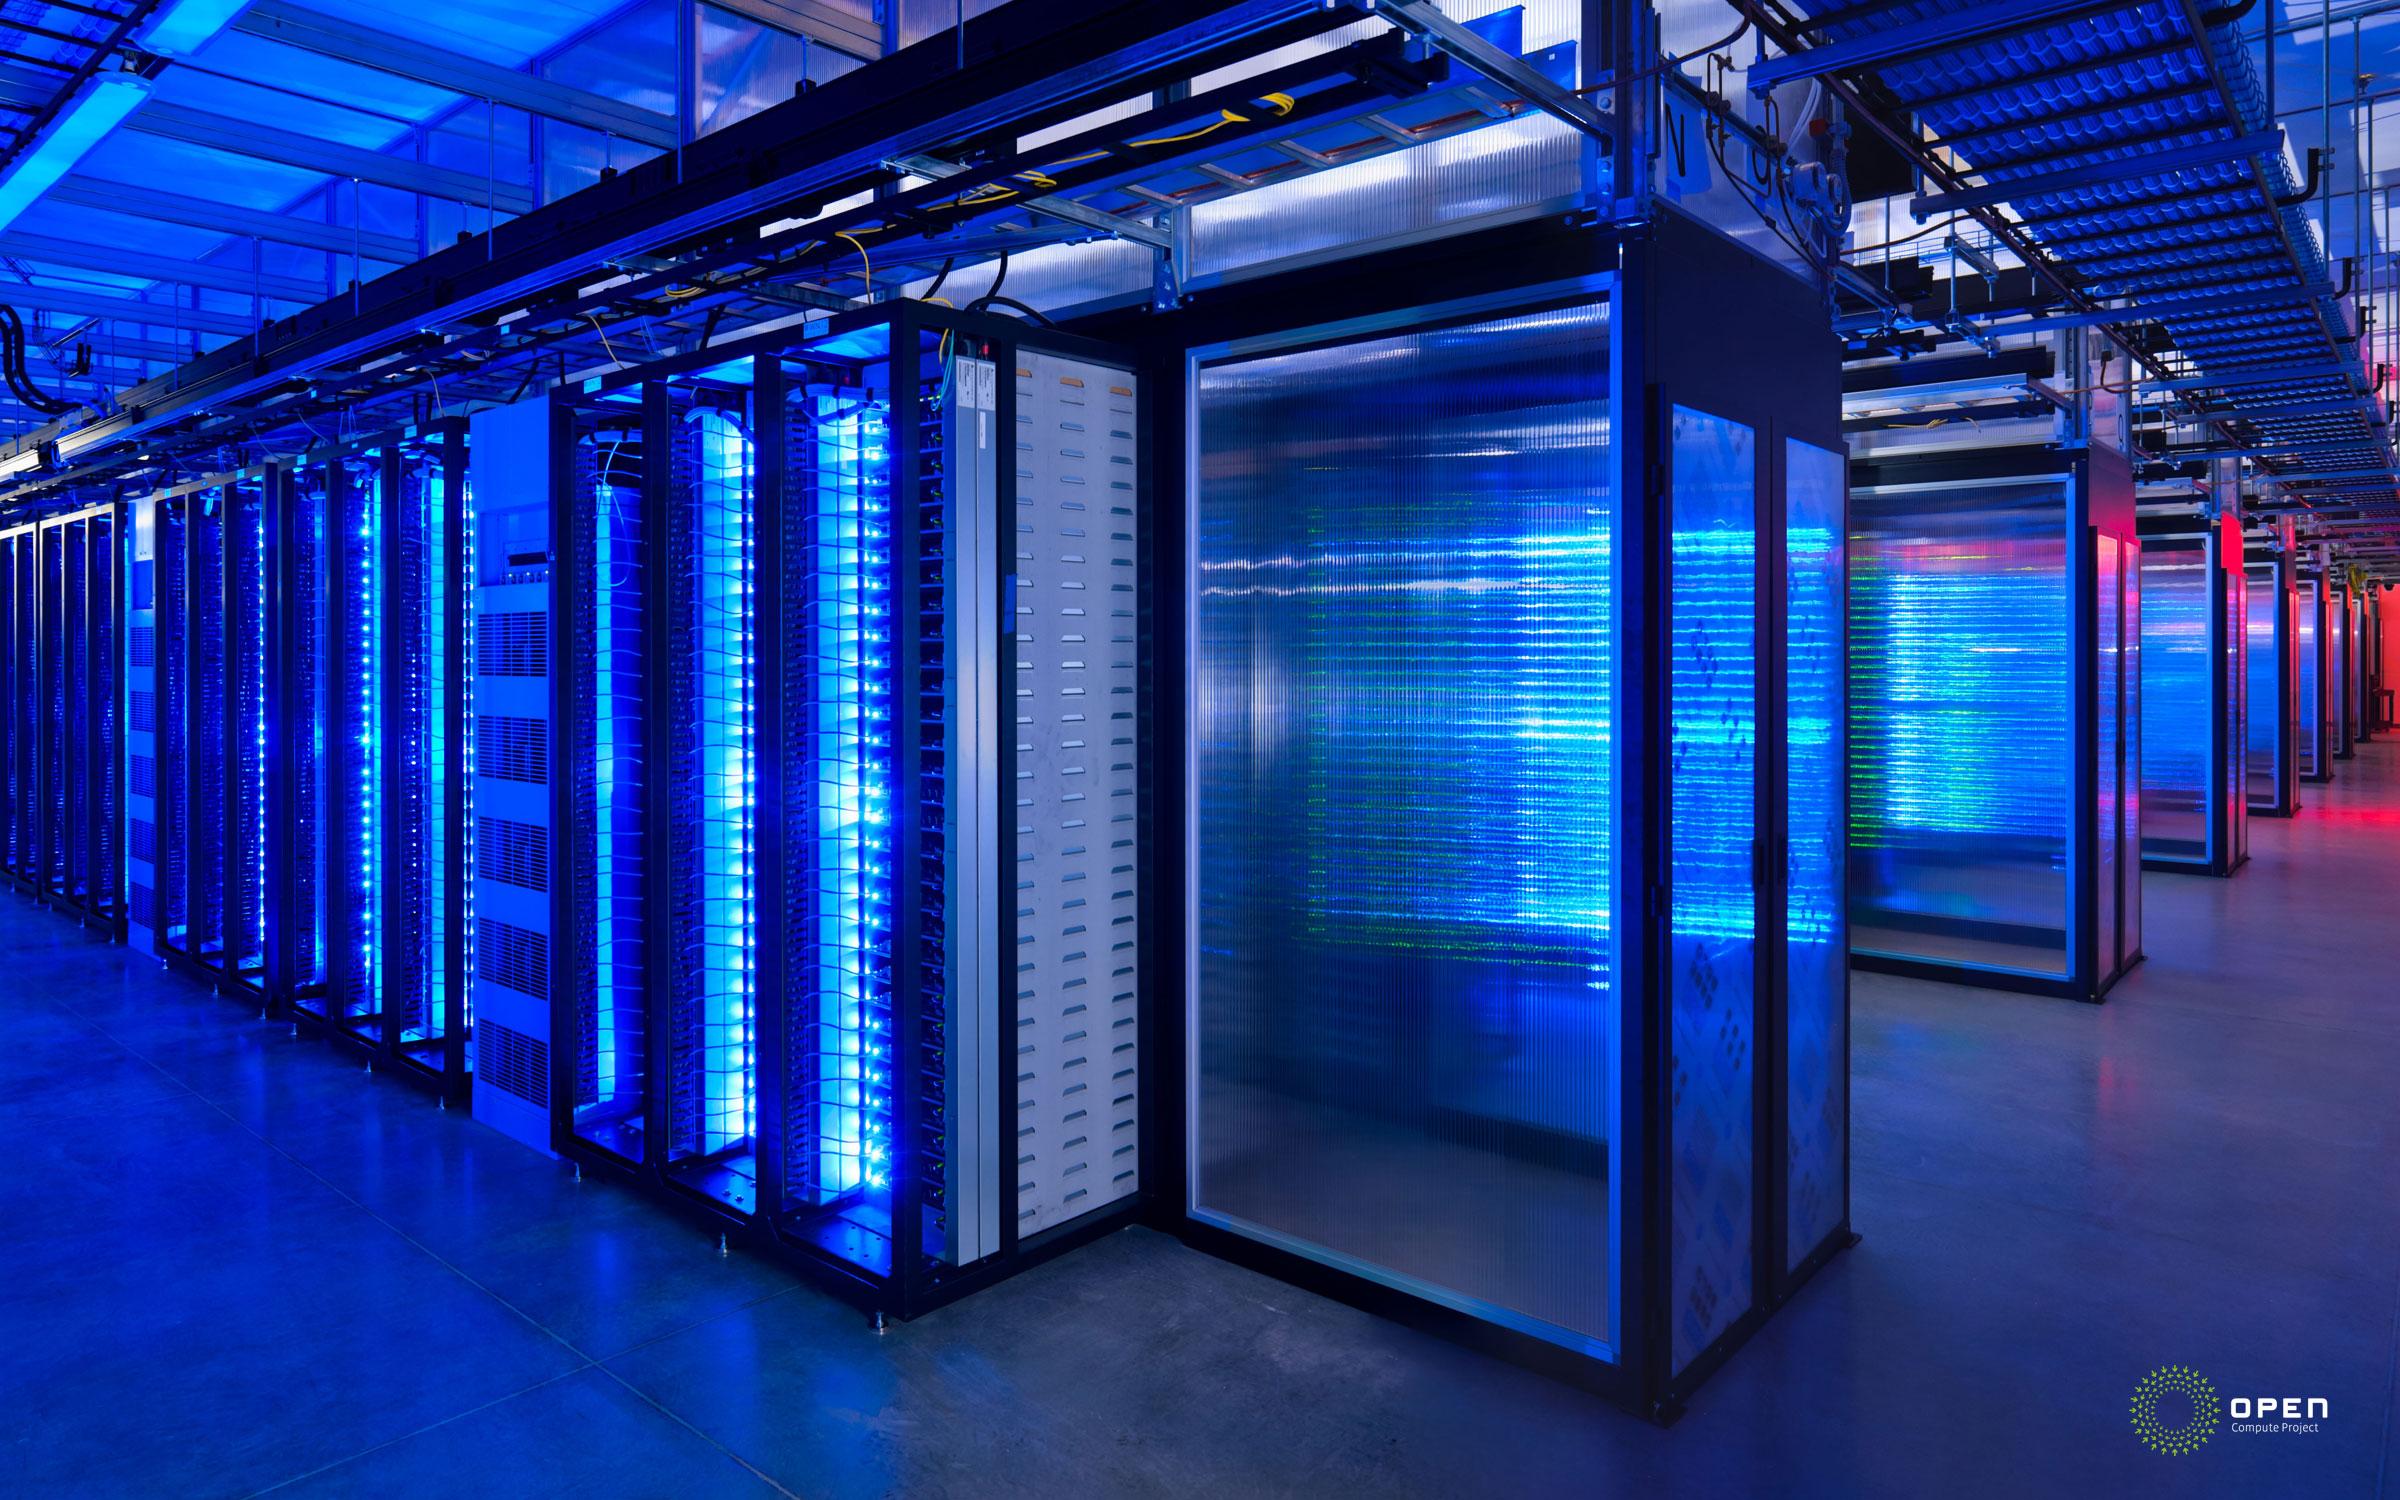 facebook-datacenter-electrical-large